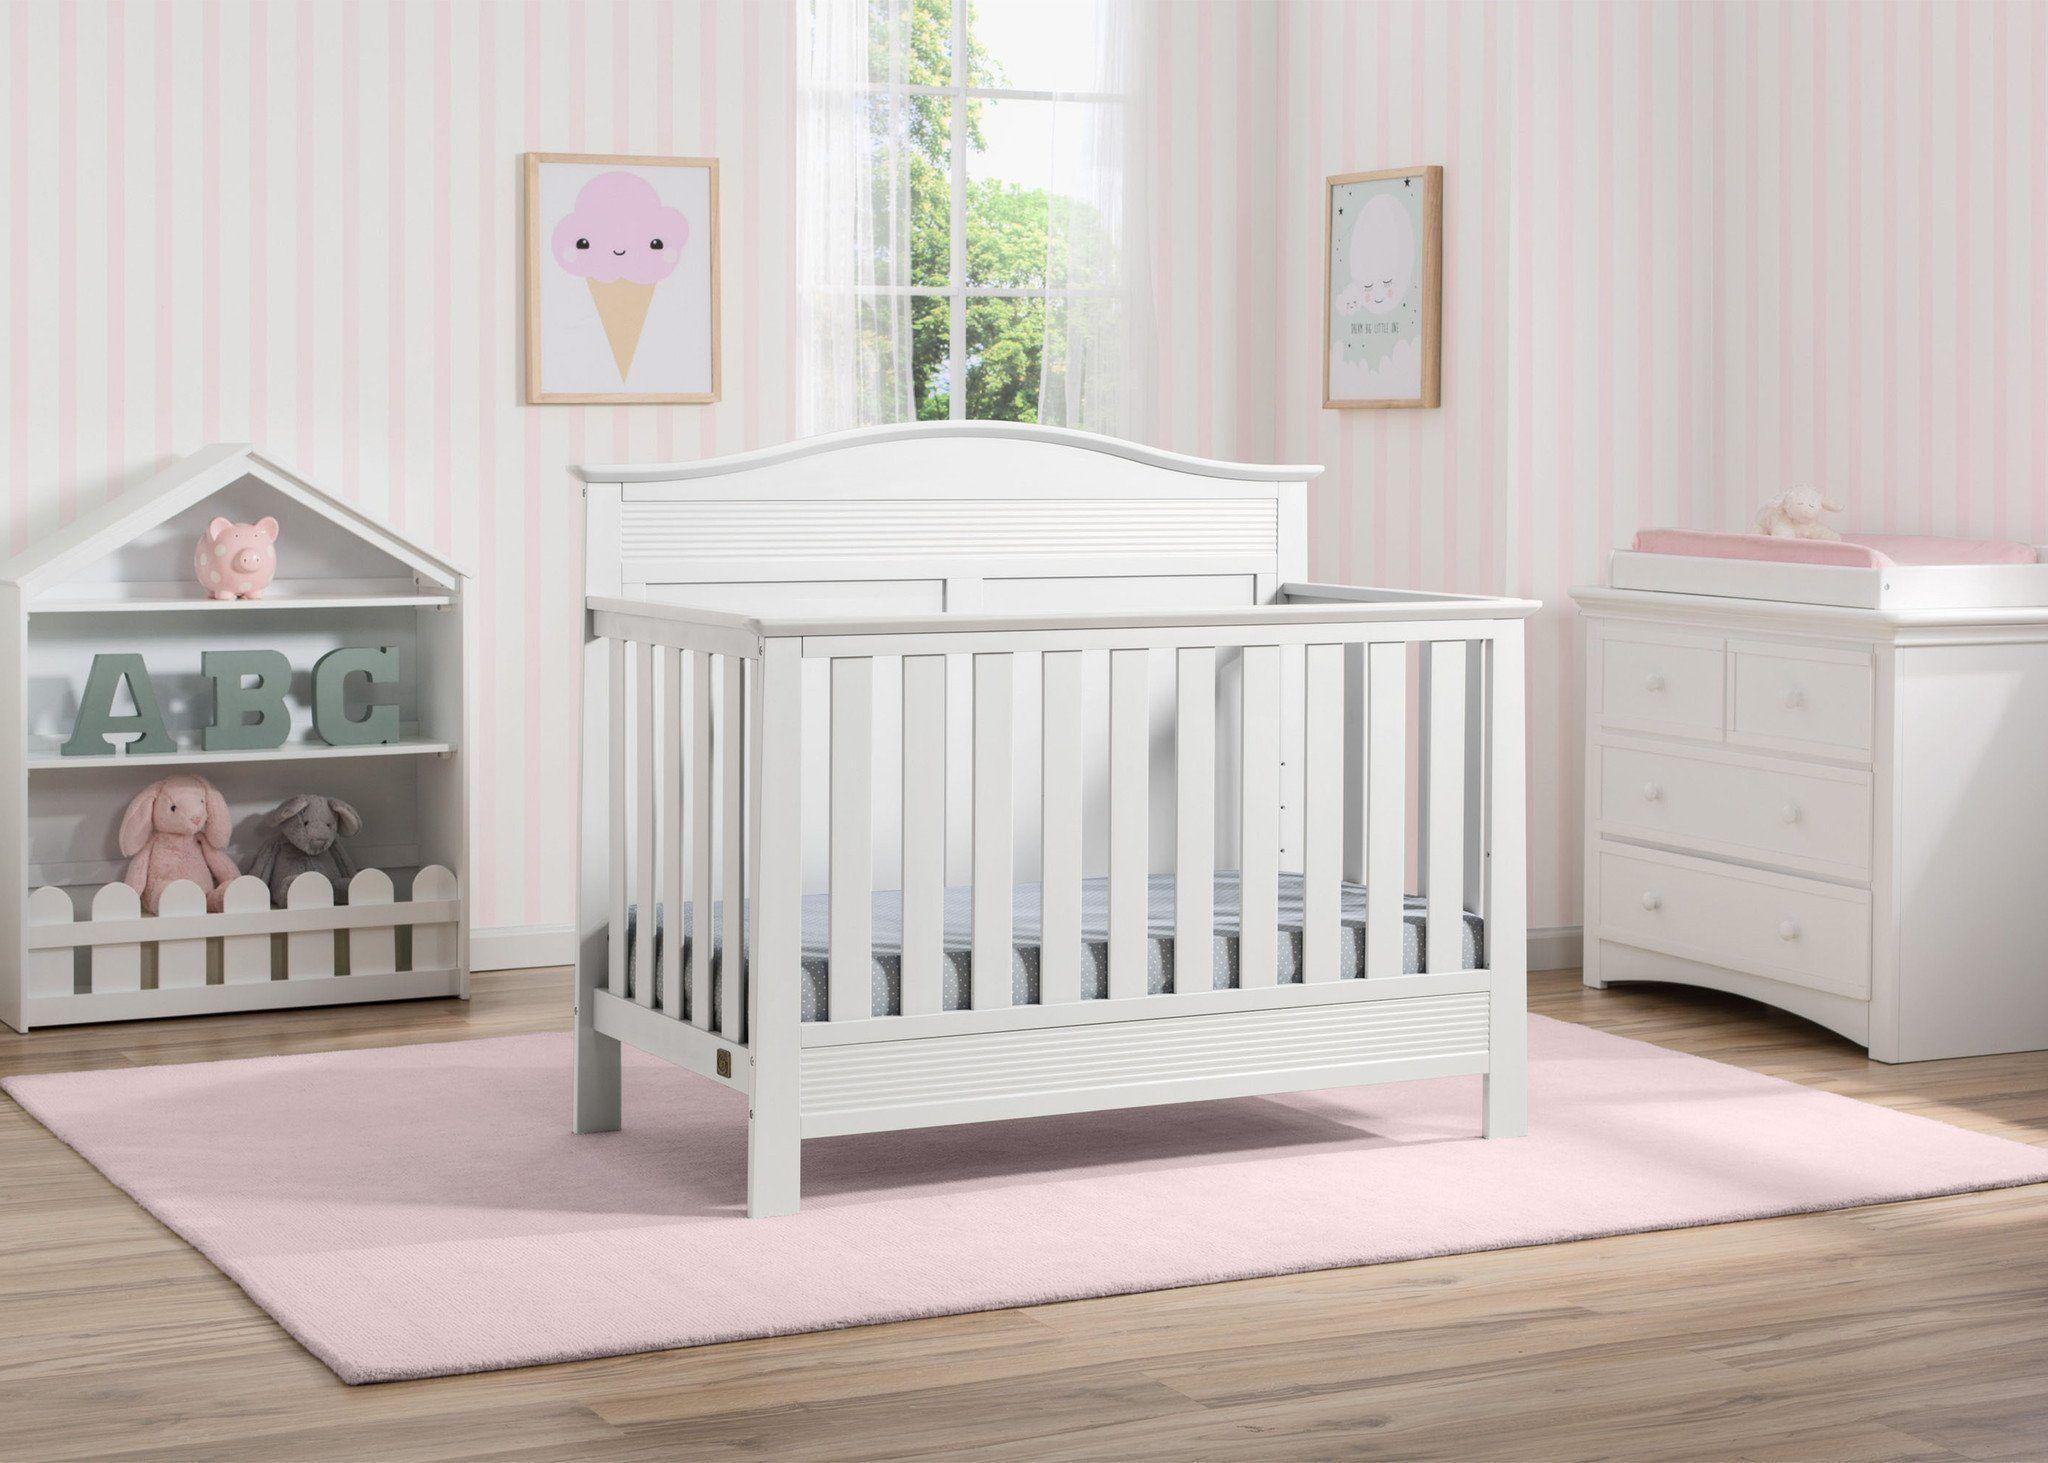 Arlo in Bianca 6Piece Nursery Set Convertible crib